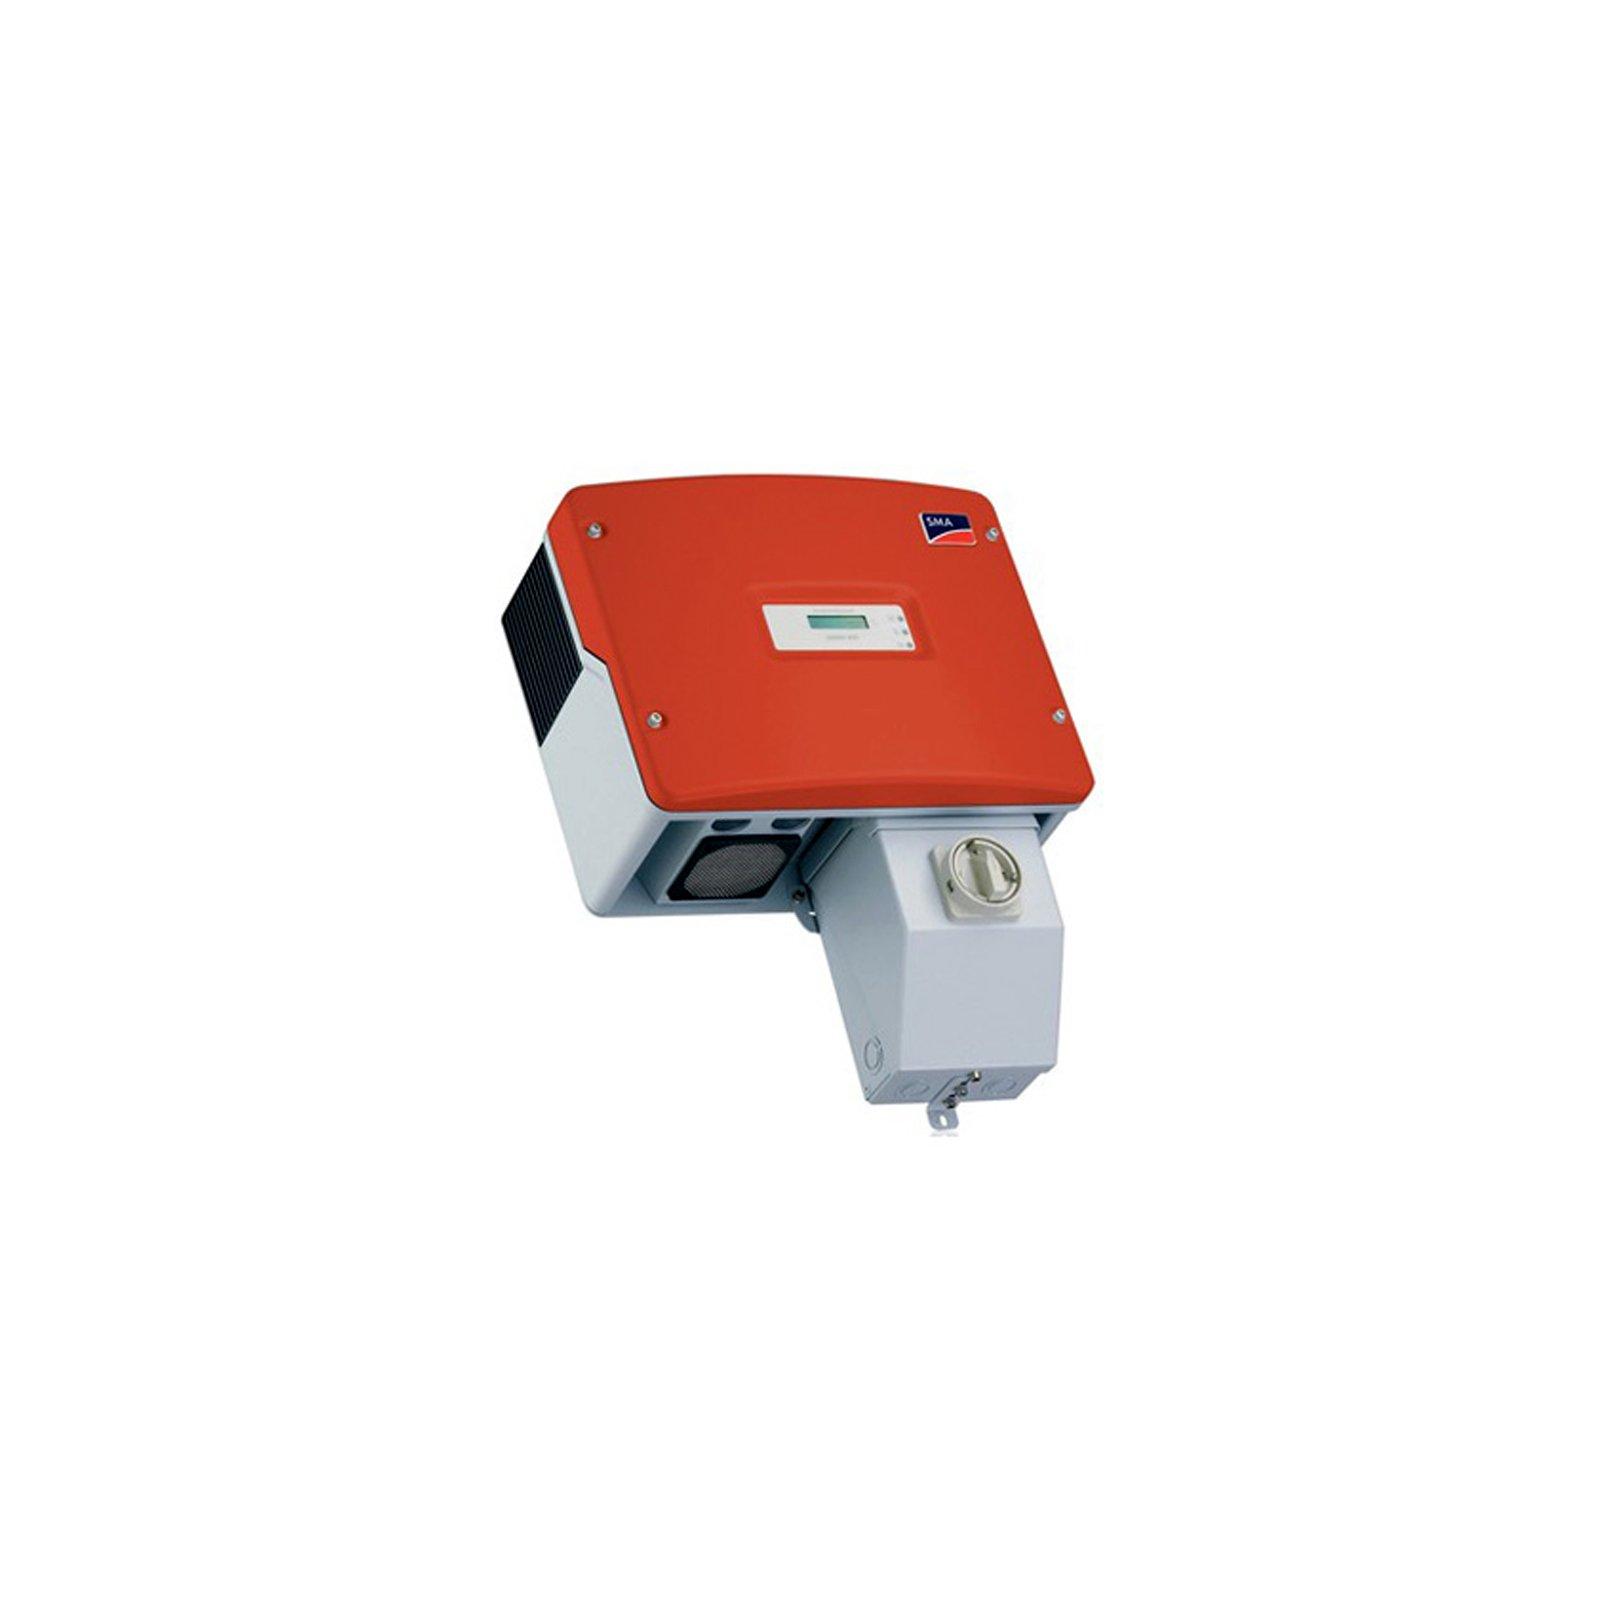 SMA SB4000US Sunny Boy 4000US Grid Tie Inverter 4200 Watts